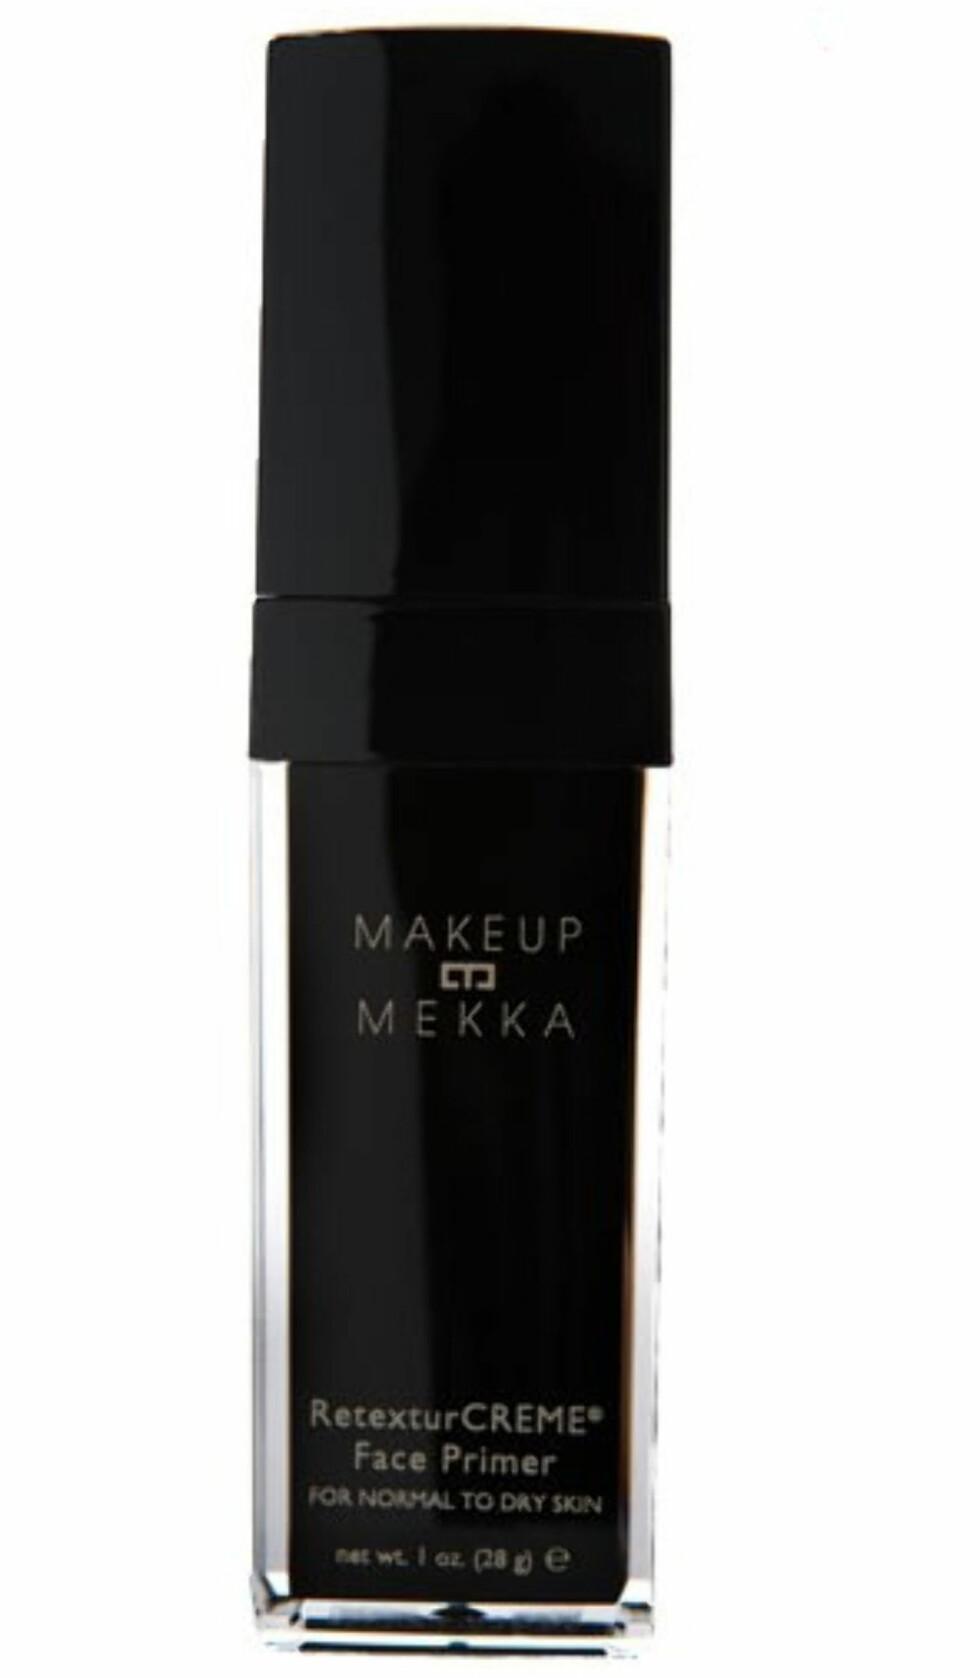 Makeup Mekka Retexture Creme Face Primer (kr.179 for 28 gram/Makeupmekka.no). Foto: Produsenten